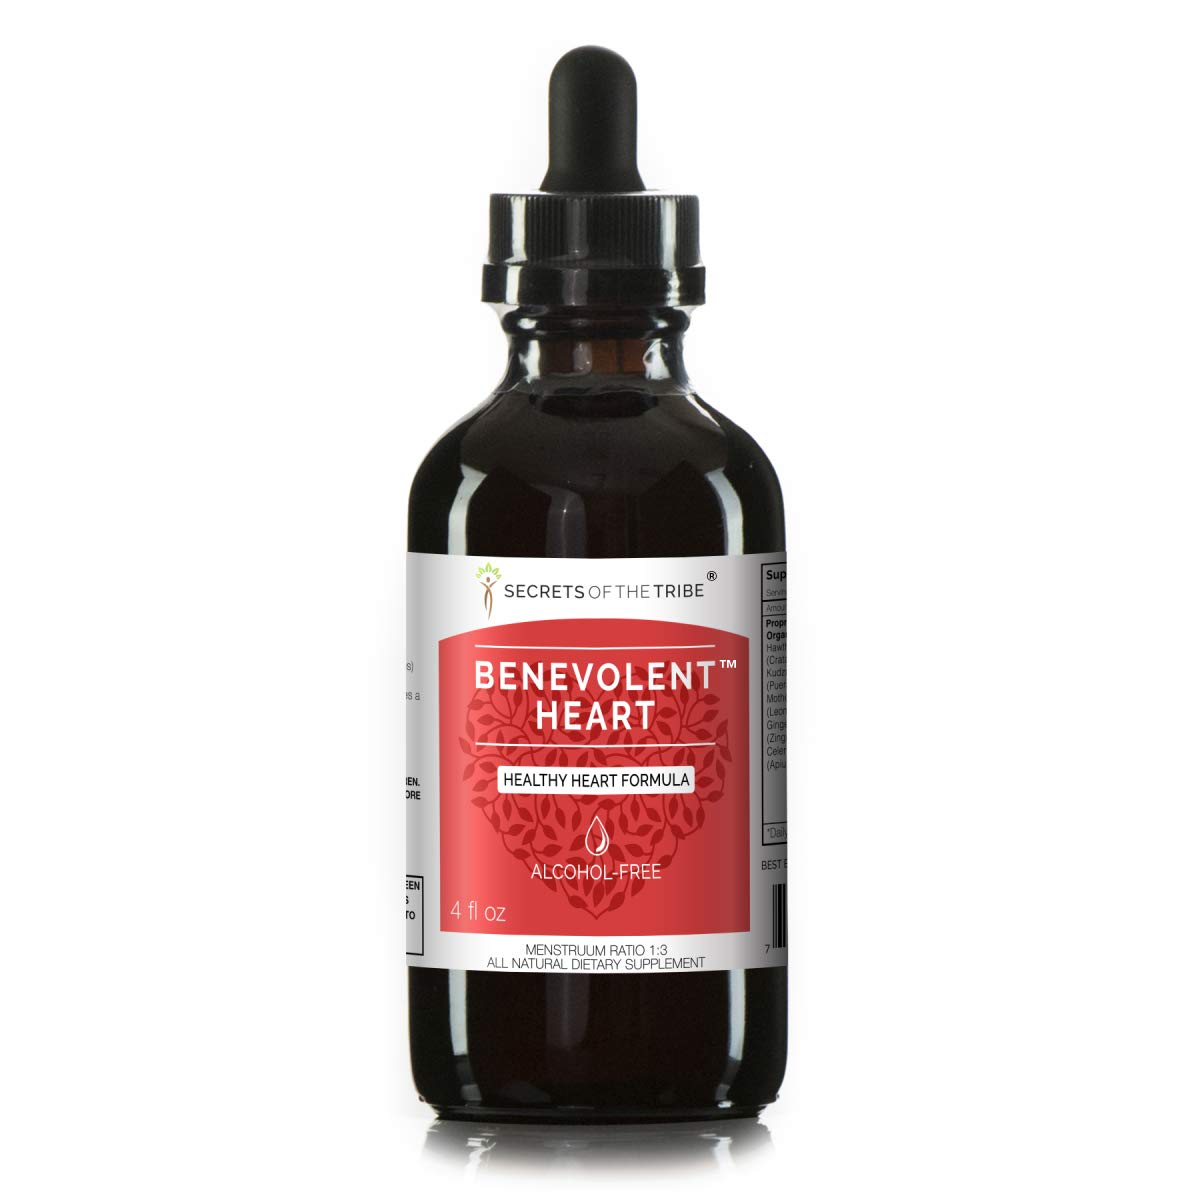 Benevolent Heart Alcohol-Free Extract, Tincture, Glycerite Hawthorn, Kudzu, Motherwort, Ginger, Celery. Healthy Heart Formula (4 fl oz)